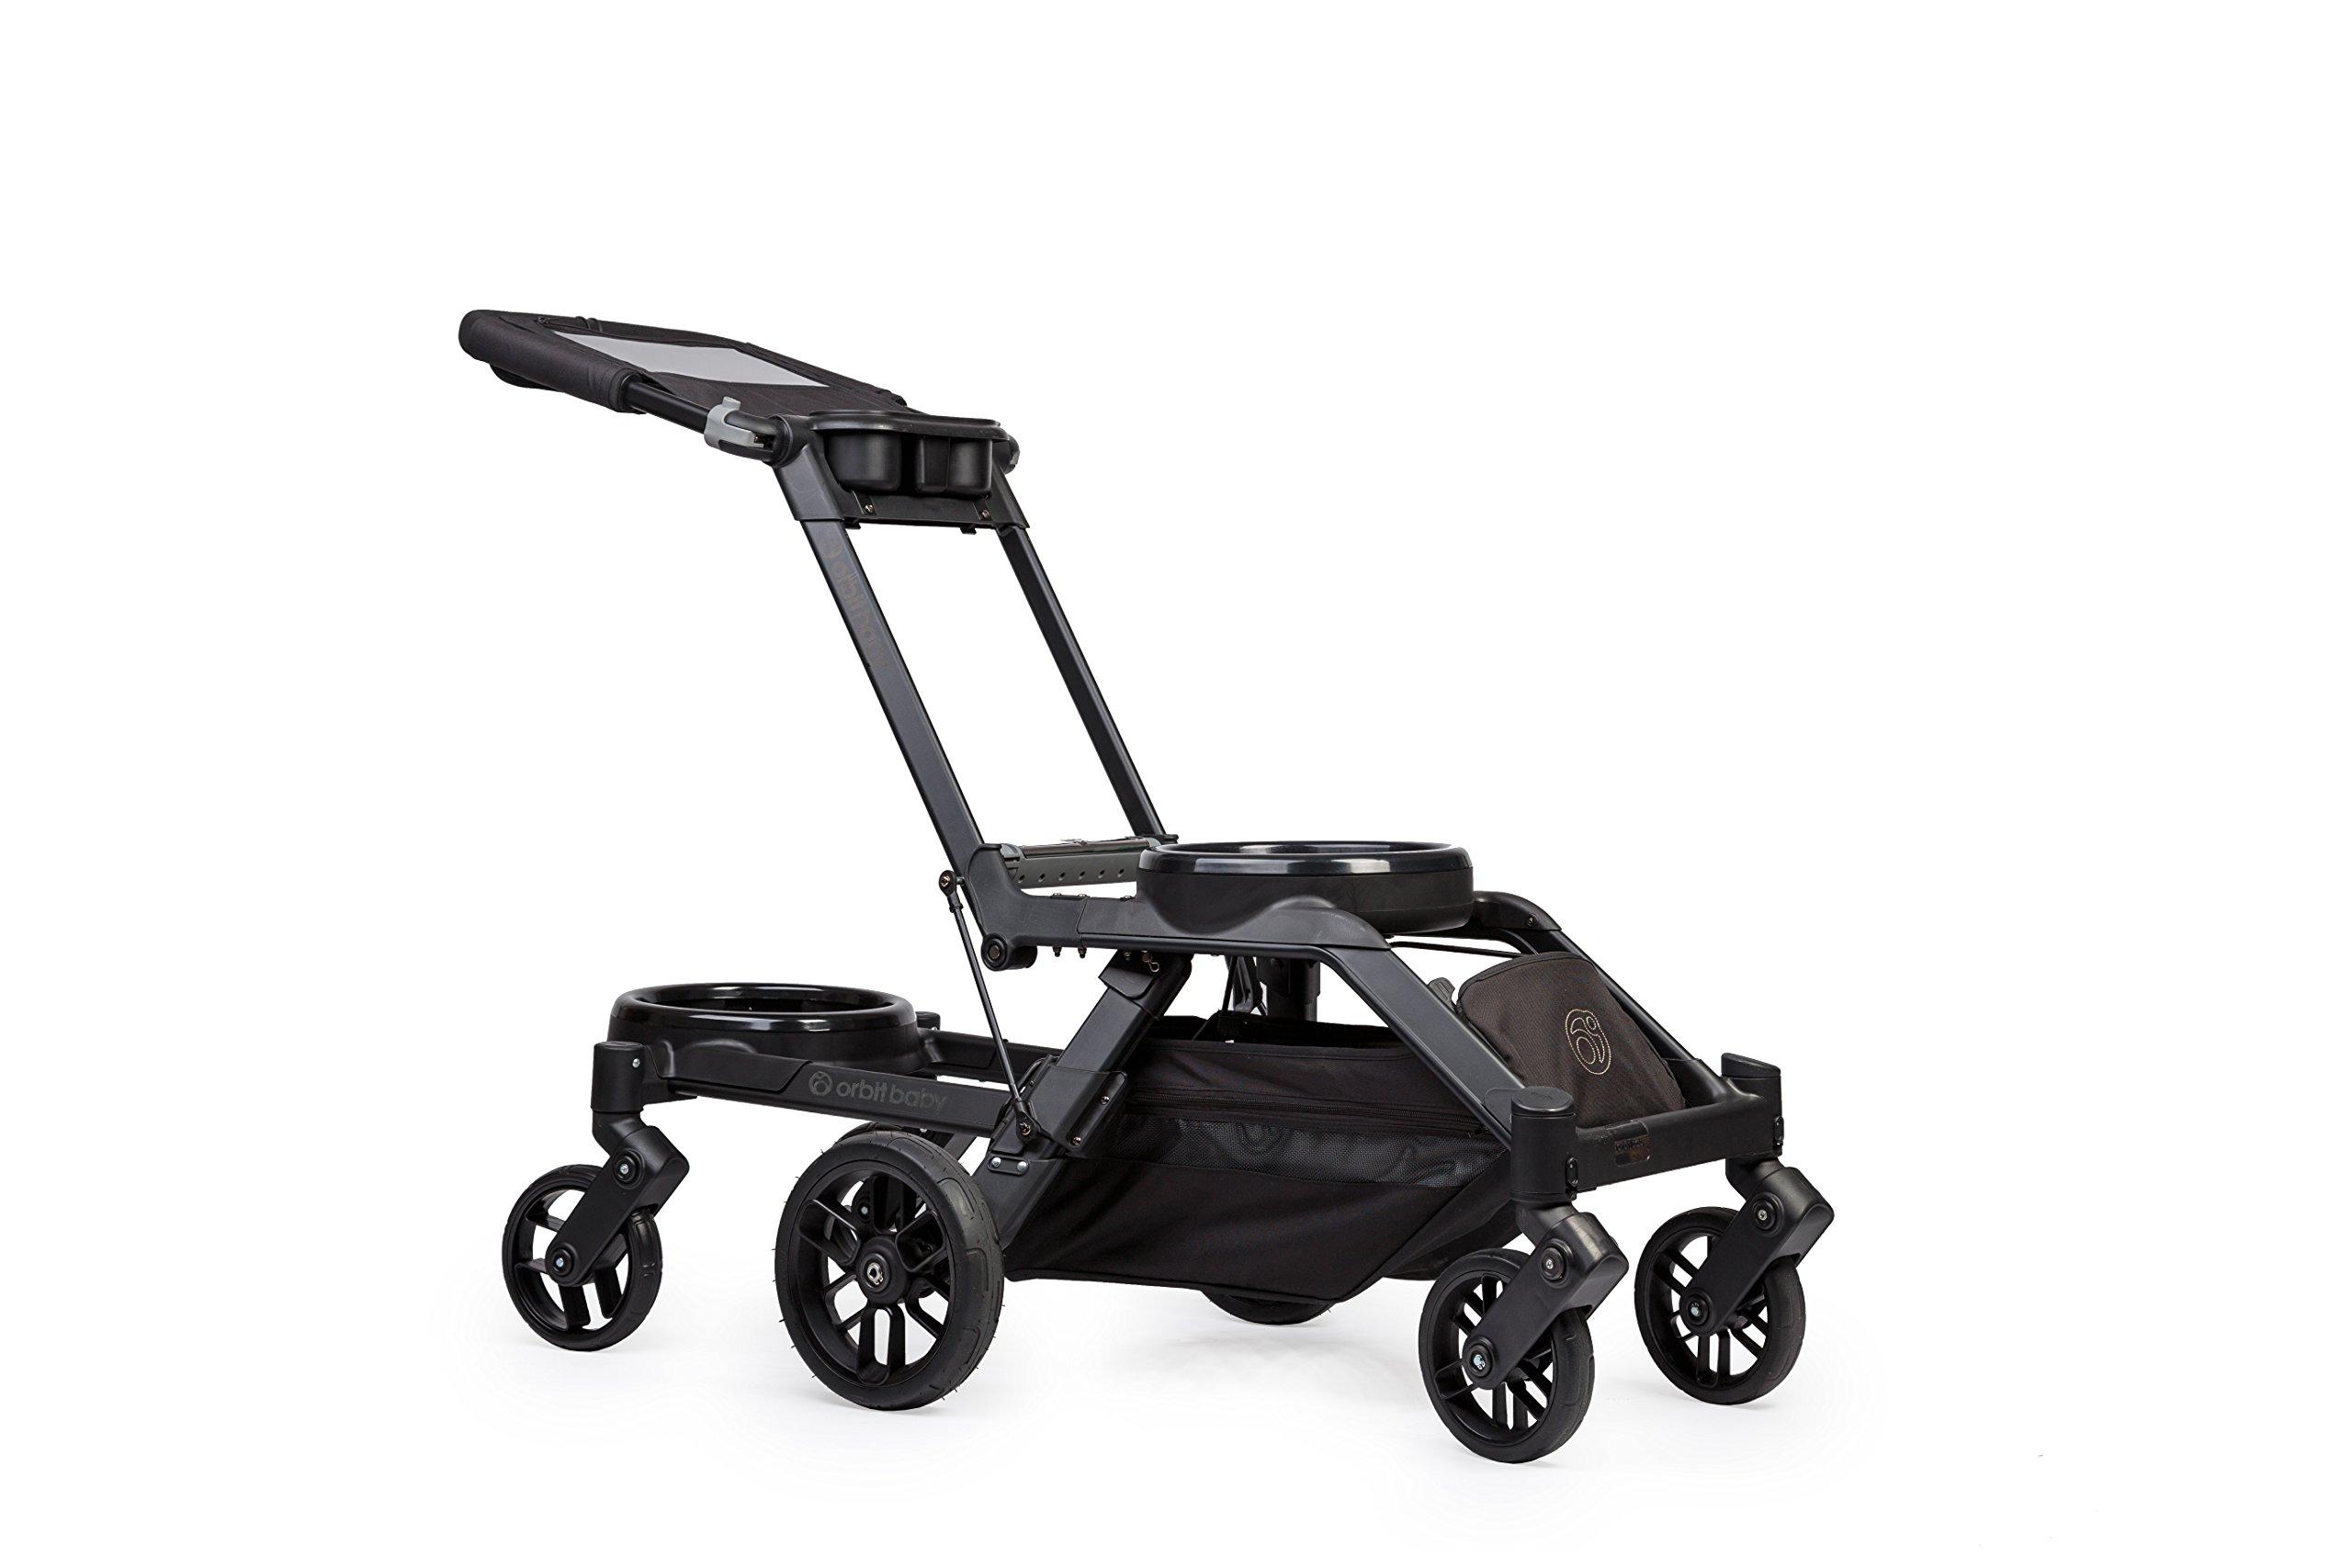 Orbit Baby Double Stroller Kit, Black